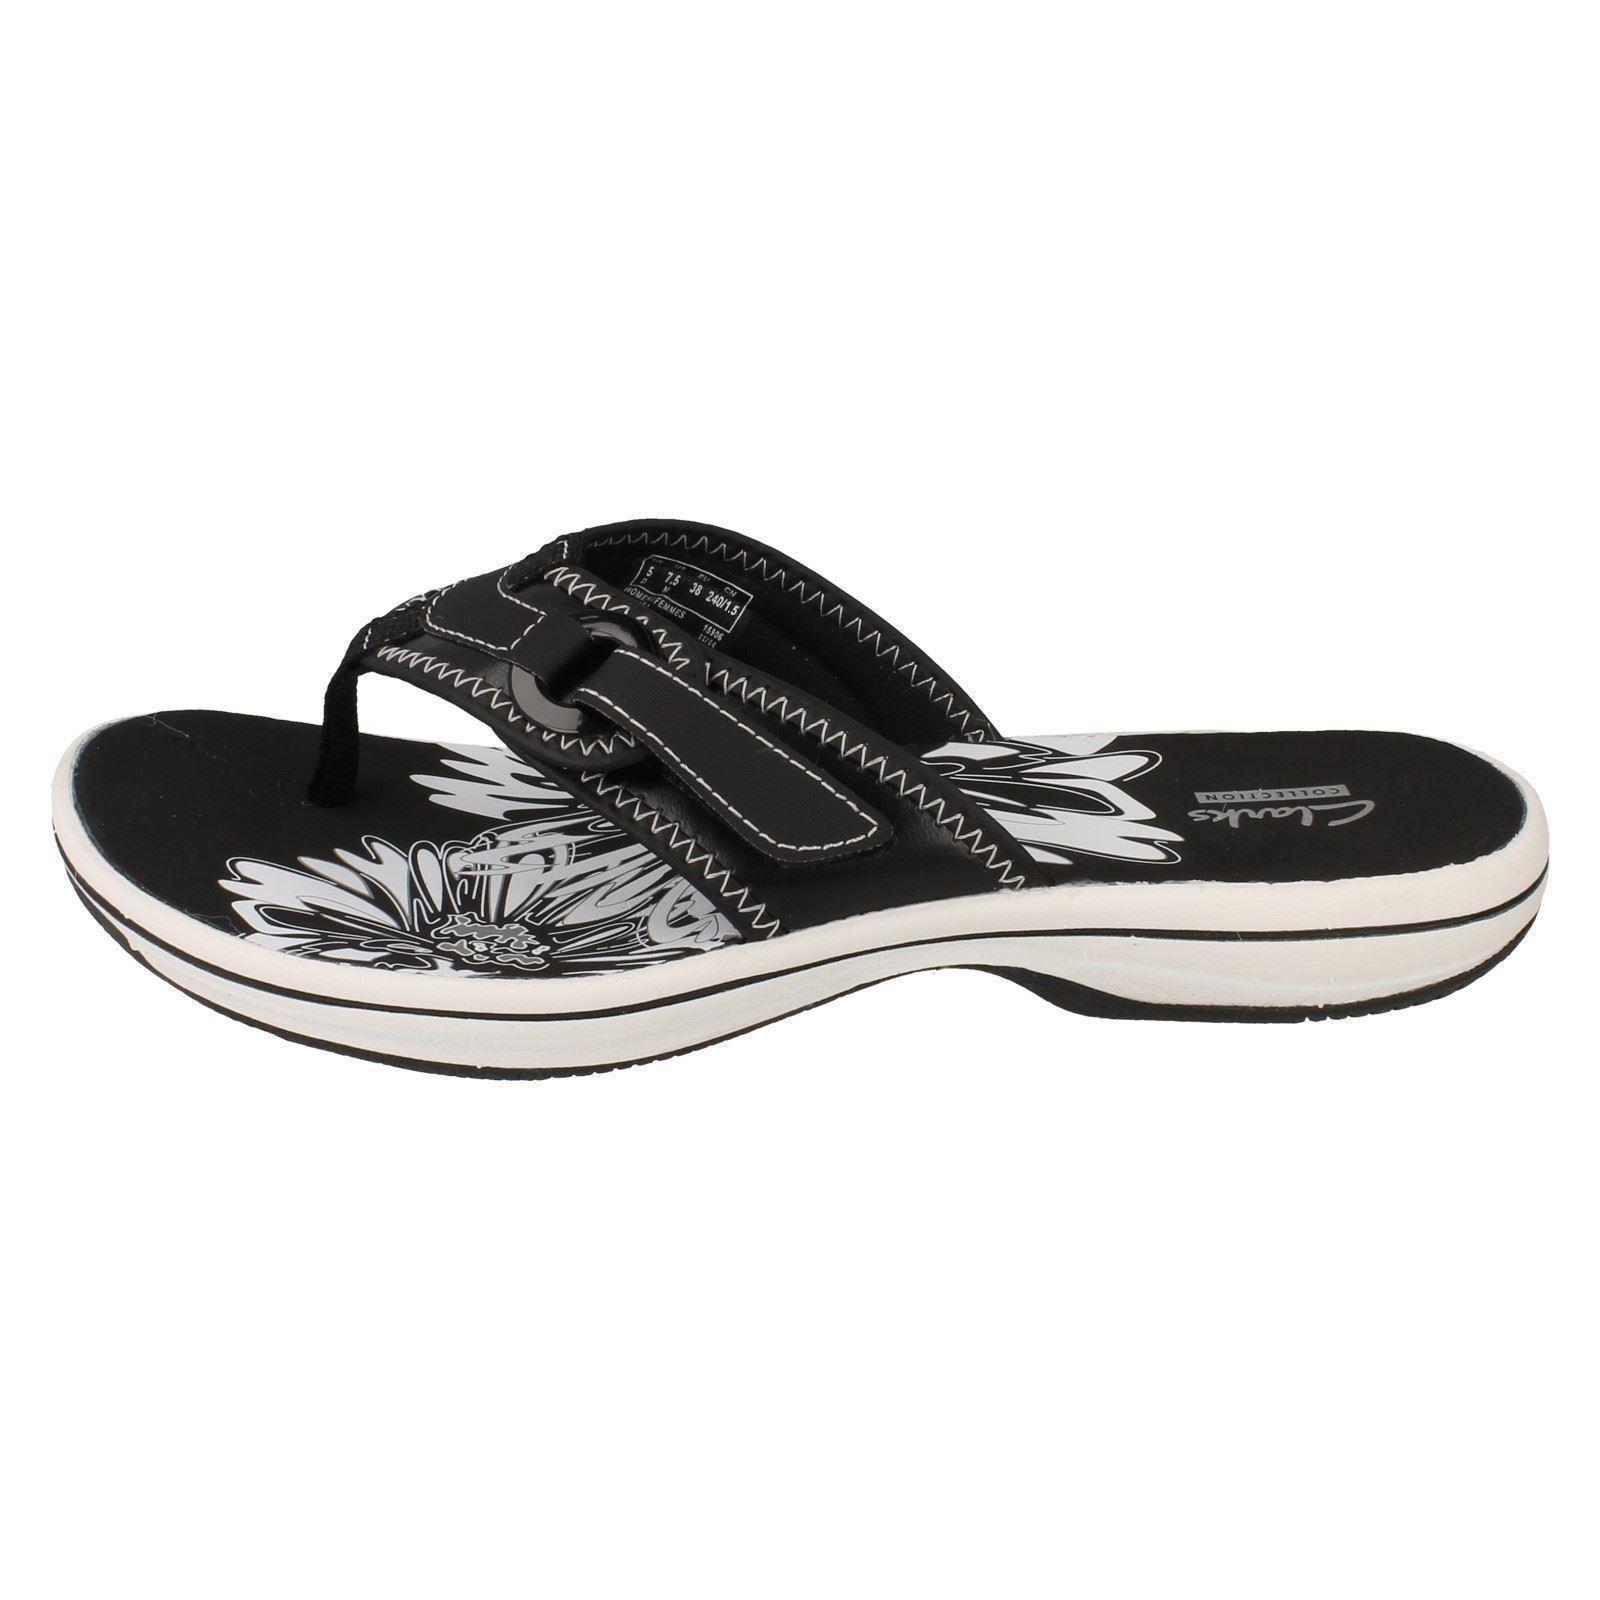 0fd607f990a Ladies Clarks Flip Flops Label - Brinkley Mila